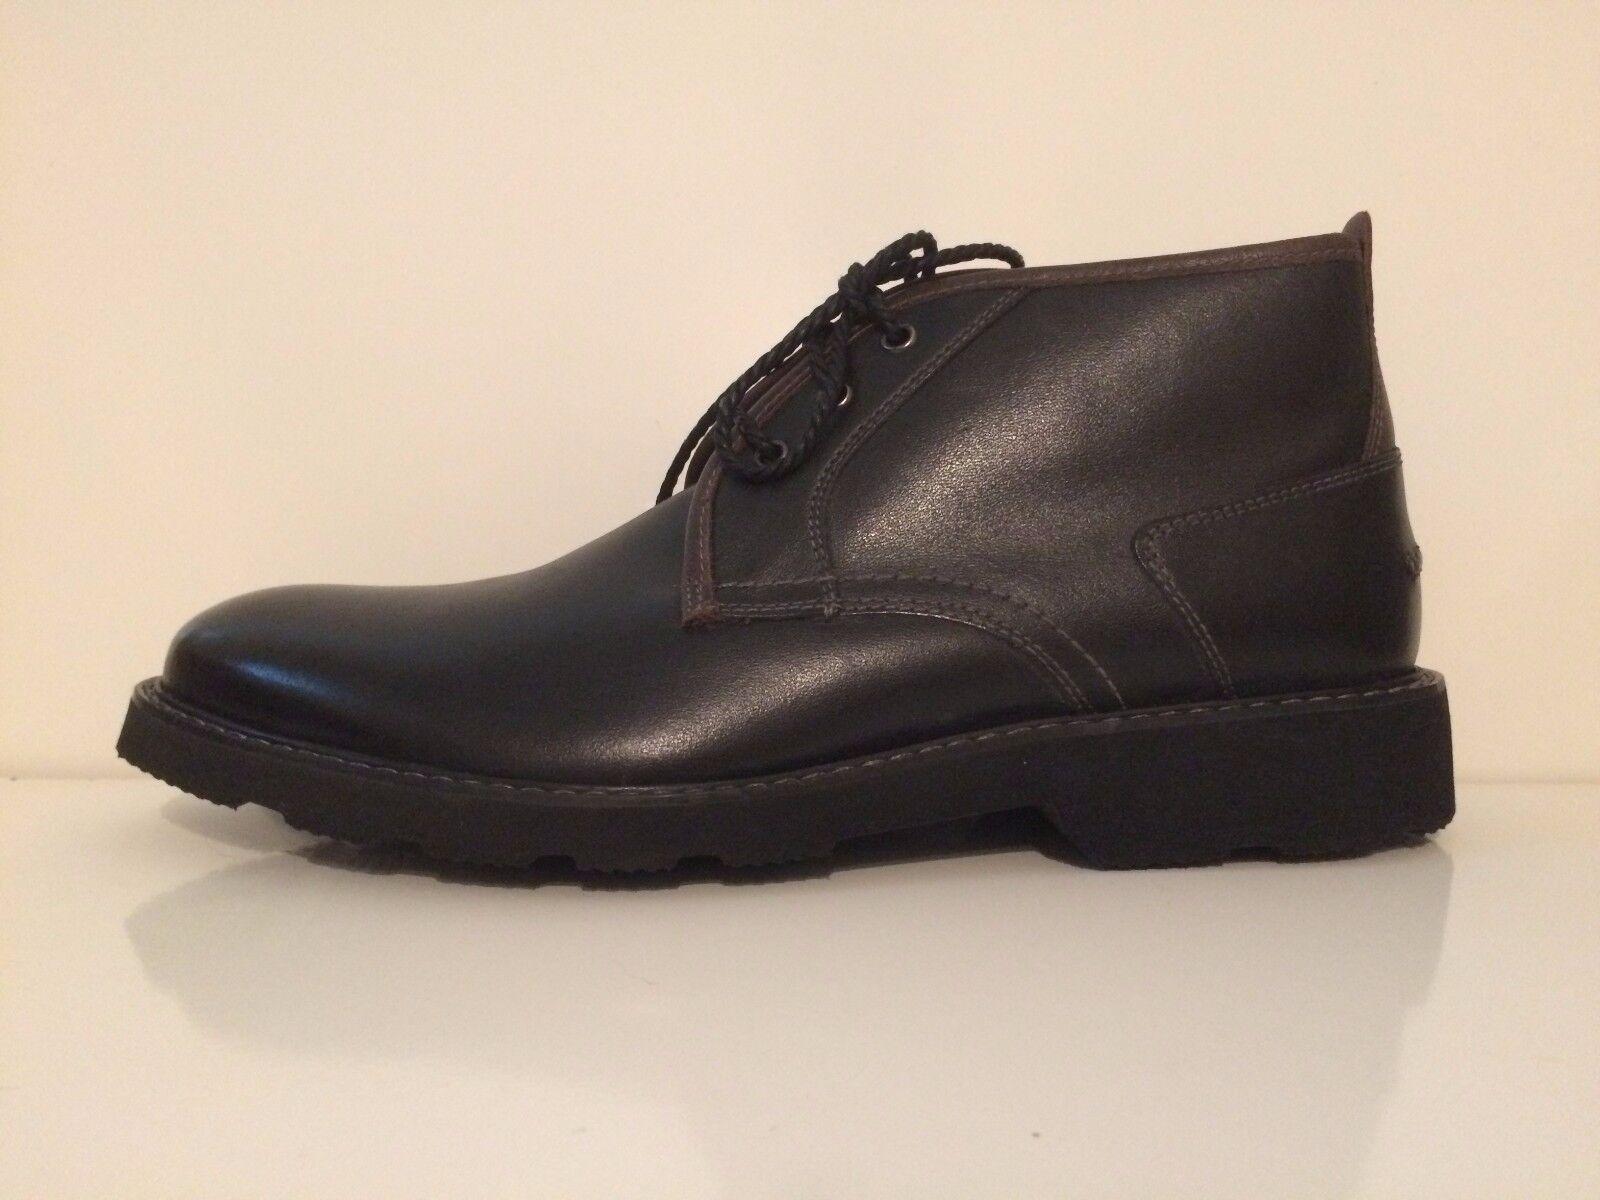 New Florsheim 13255 Men Casey Chukka Ankle Leather Boots sz 8.5D M